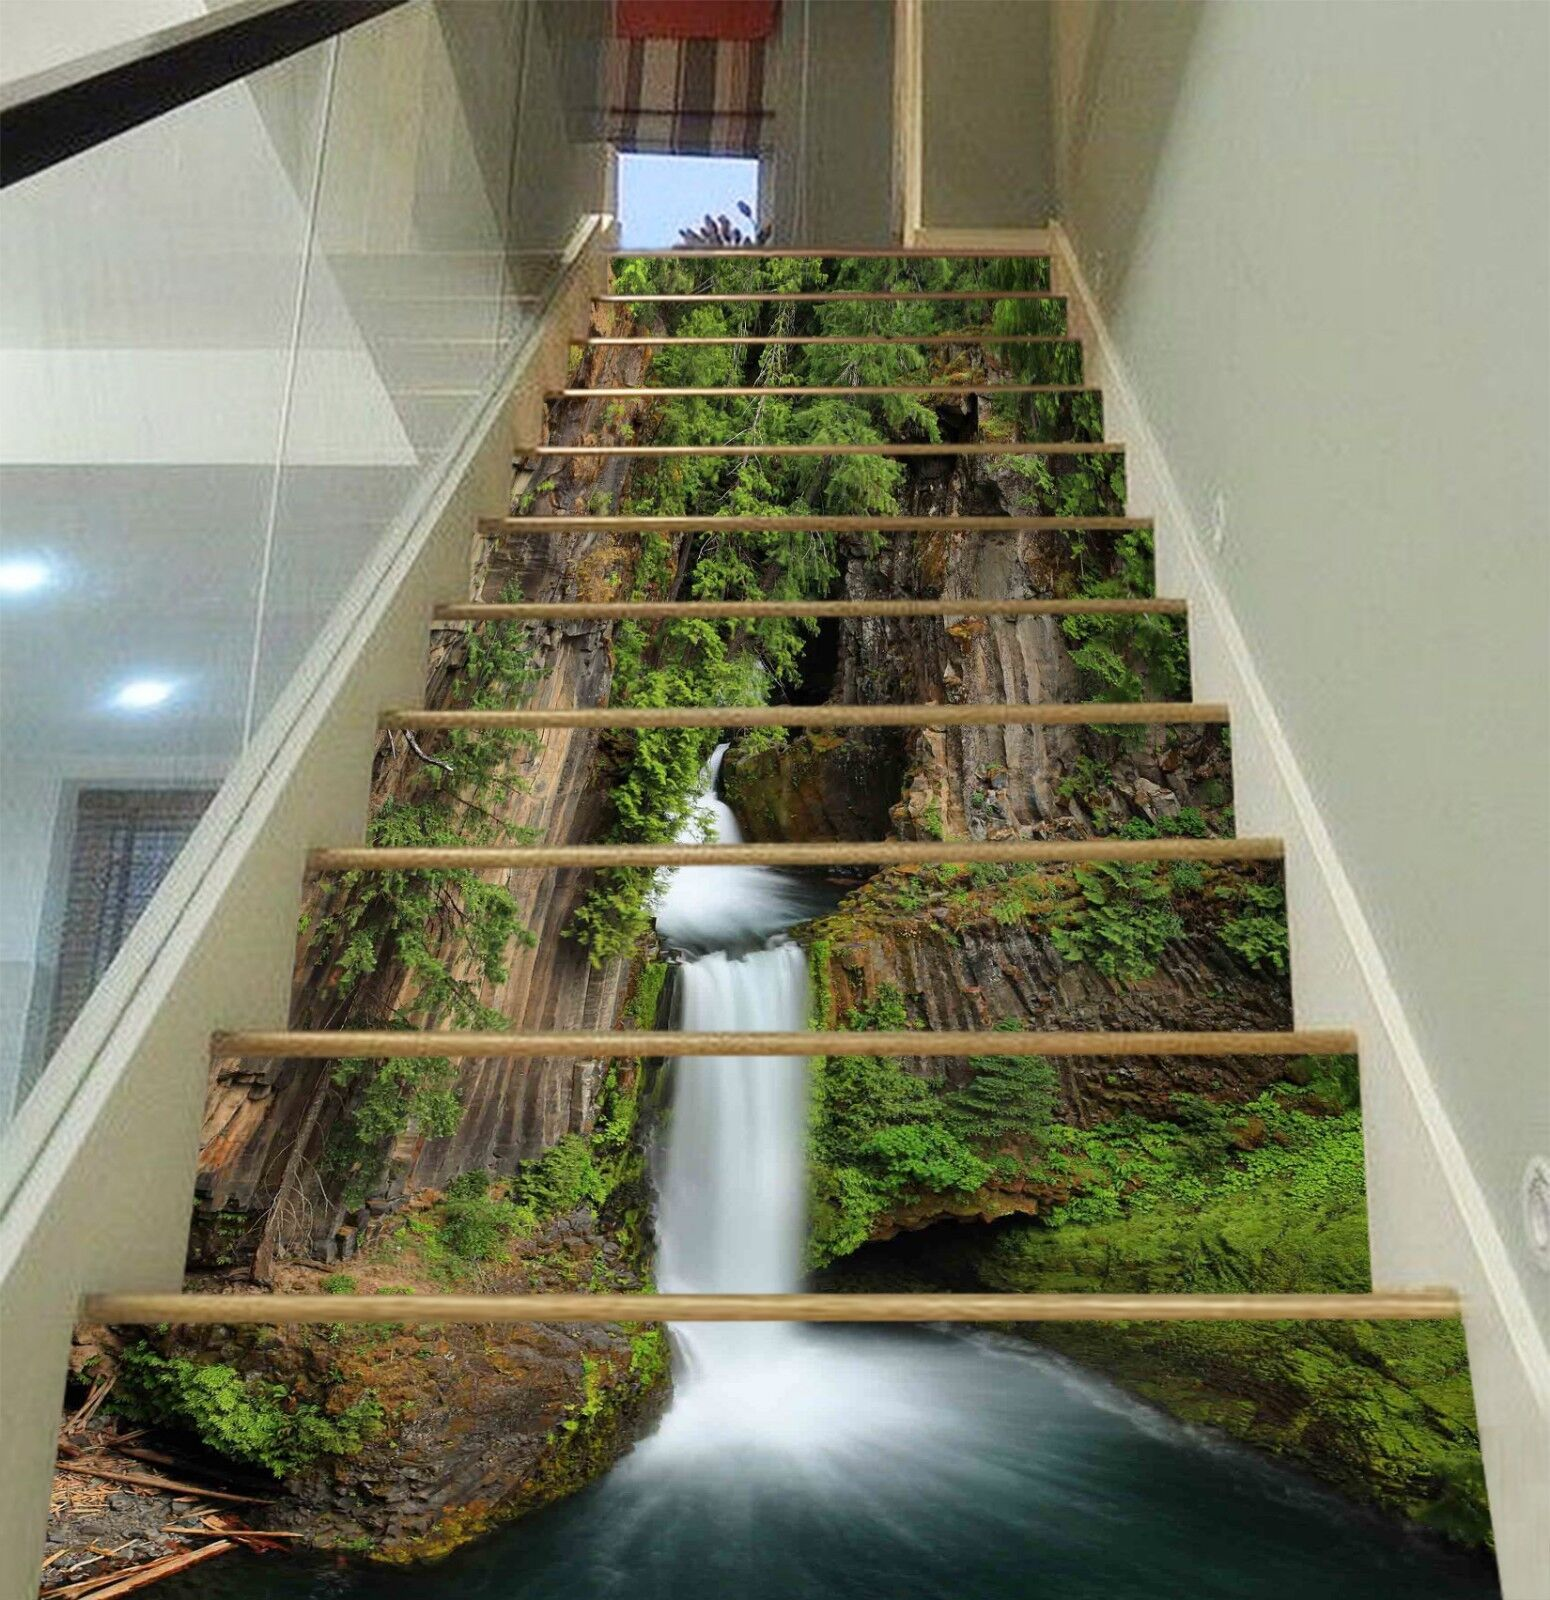 3D Stream Leaf Stair Risers Decoration Photo Mural Vinyl Decal Wallpaper UK